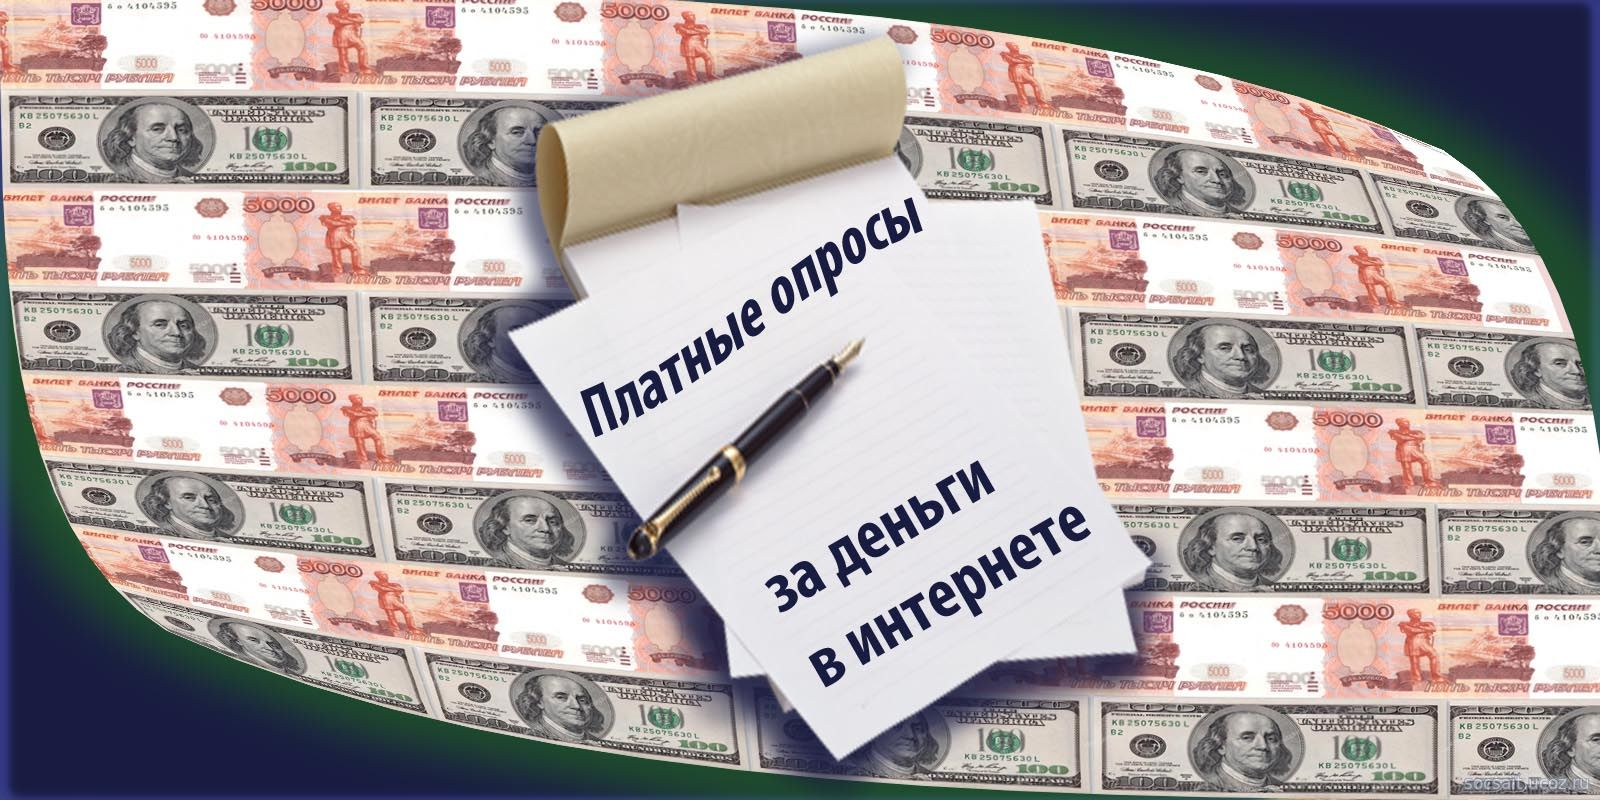 Деньги в долг на мтс онлайн